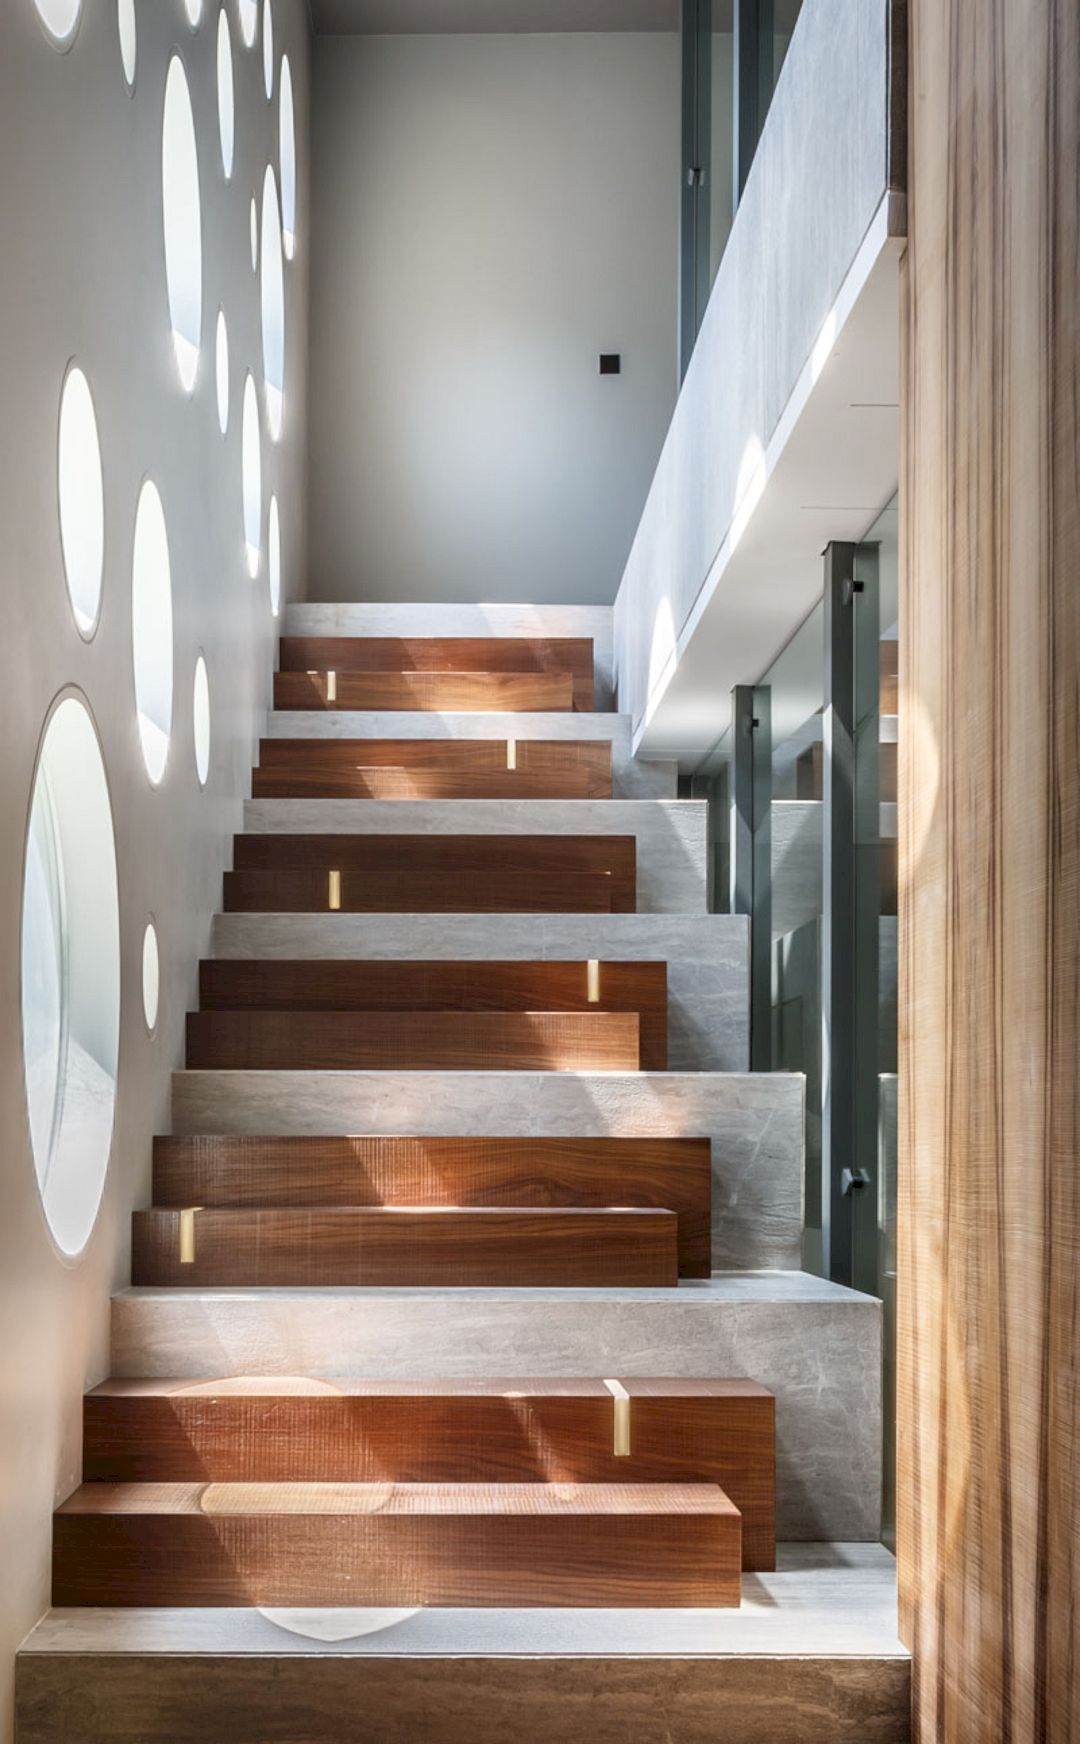 Impressive Staircase Design Inspirations Https Www Futuristarchitecture 23668 Html